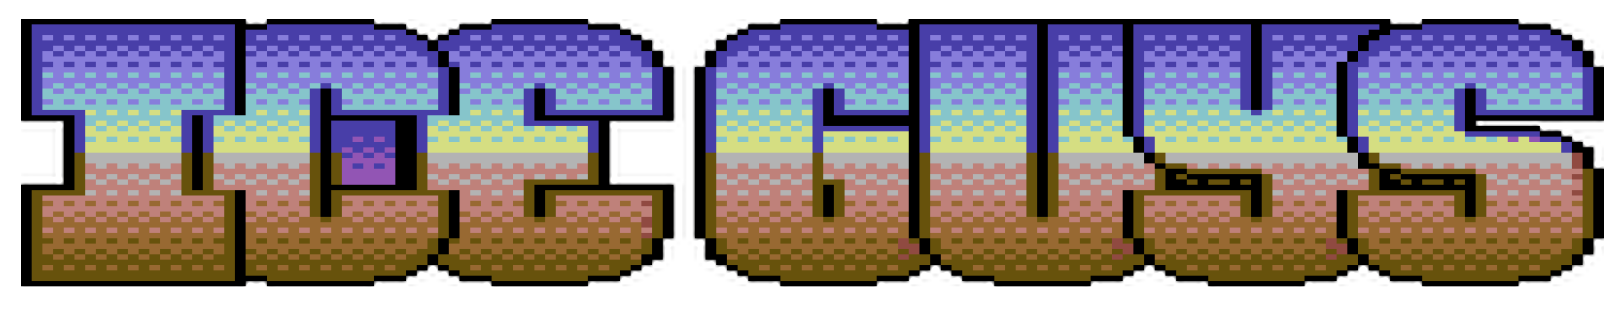 Ice Guys (C64)